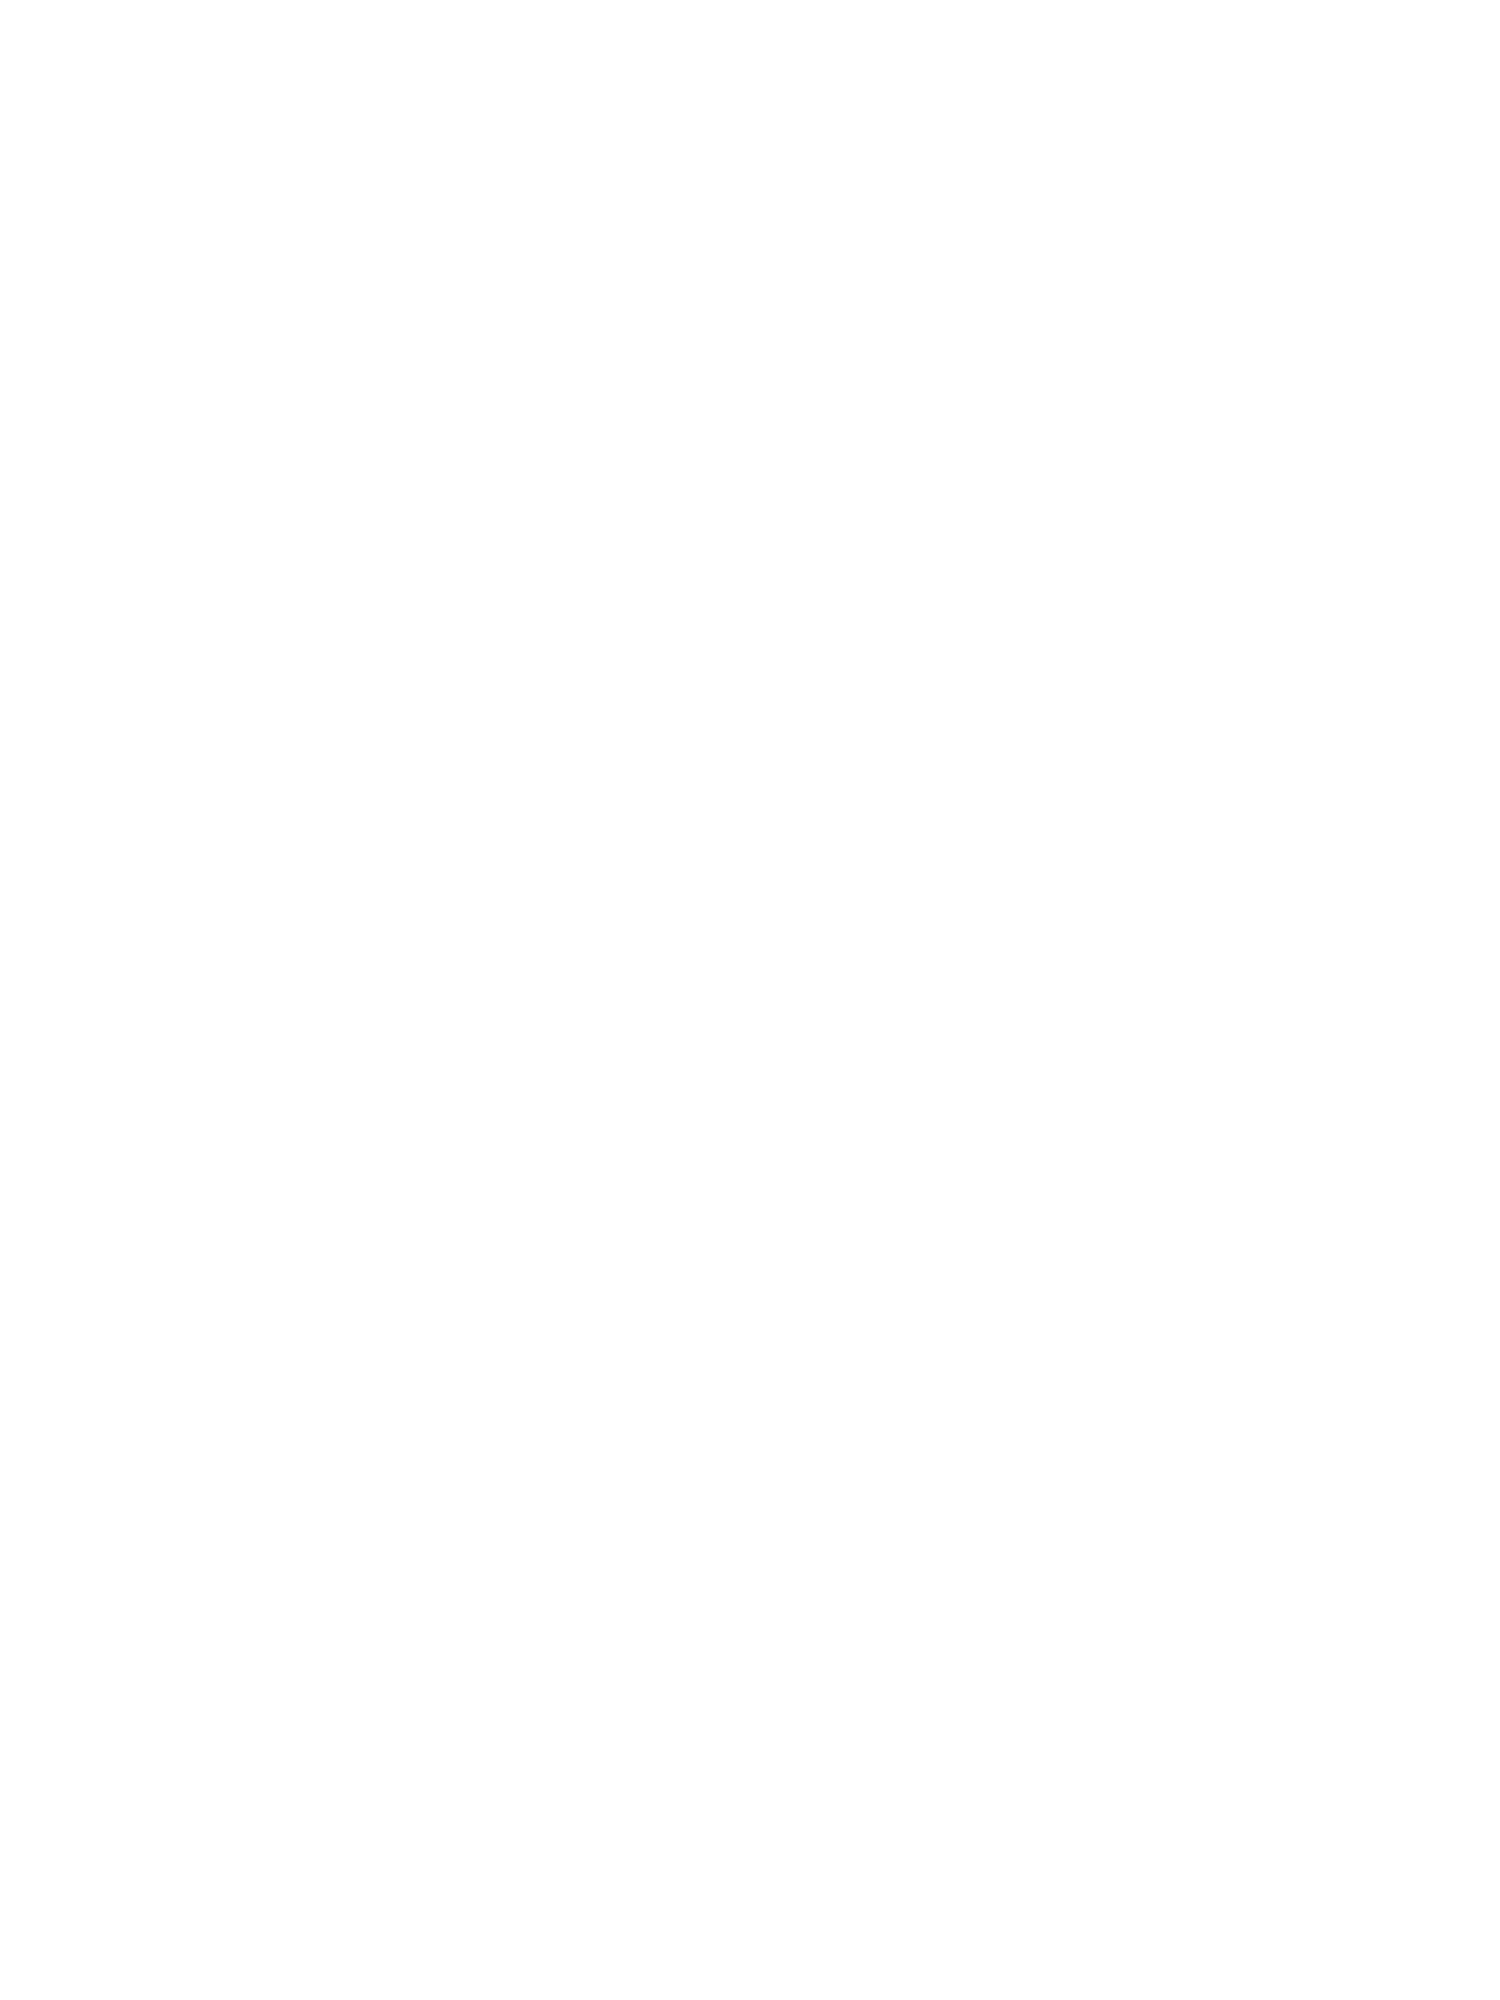 josselin-tourette-ebennistes-typo